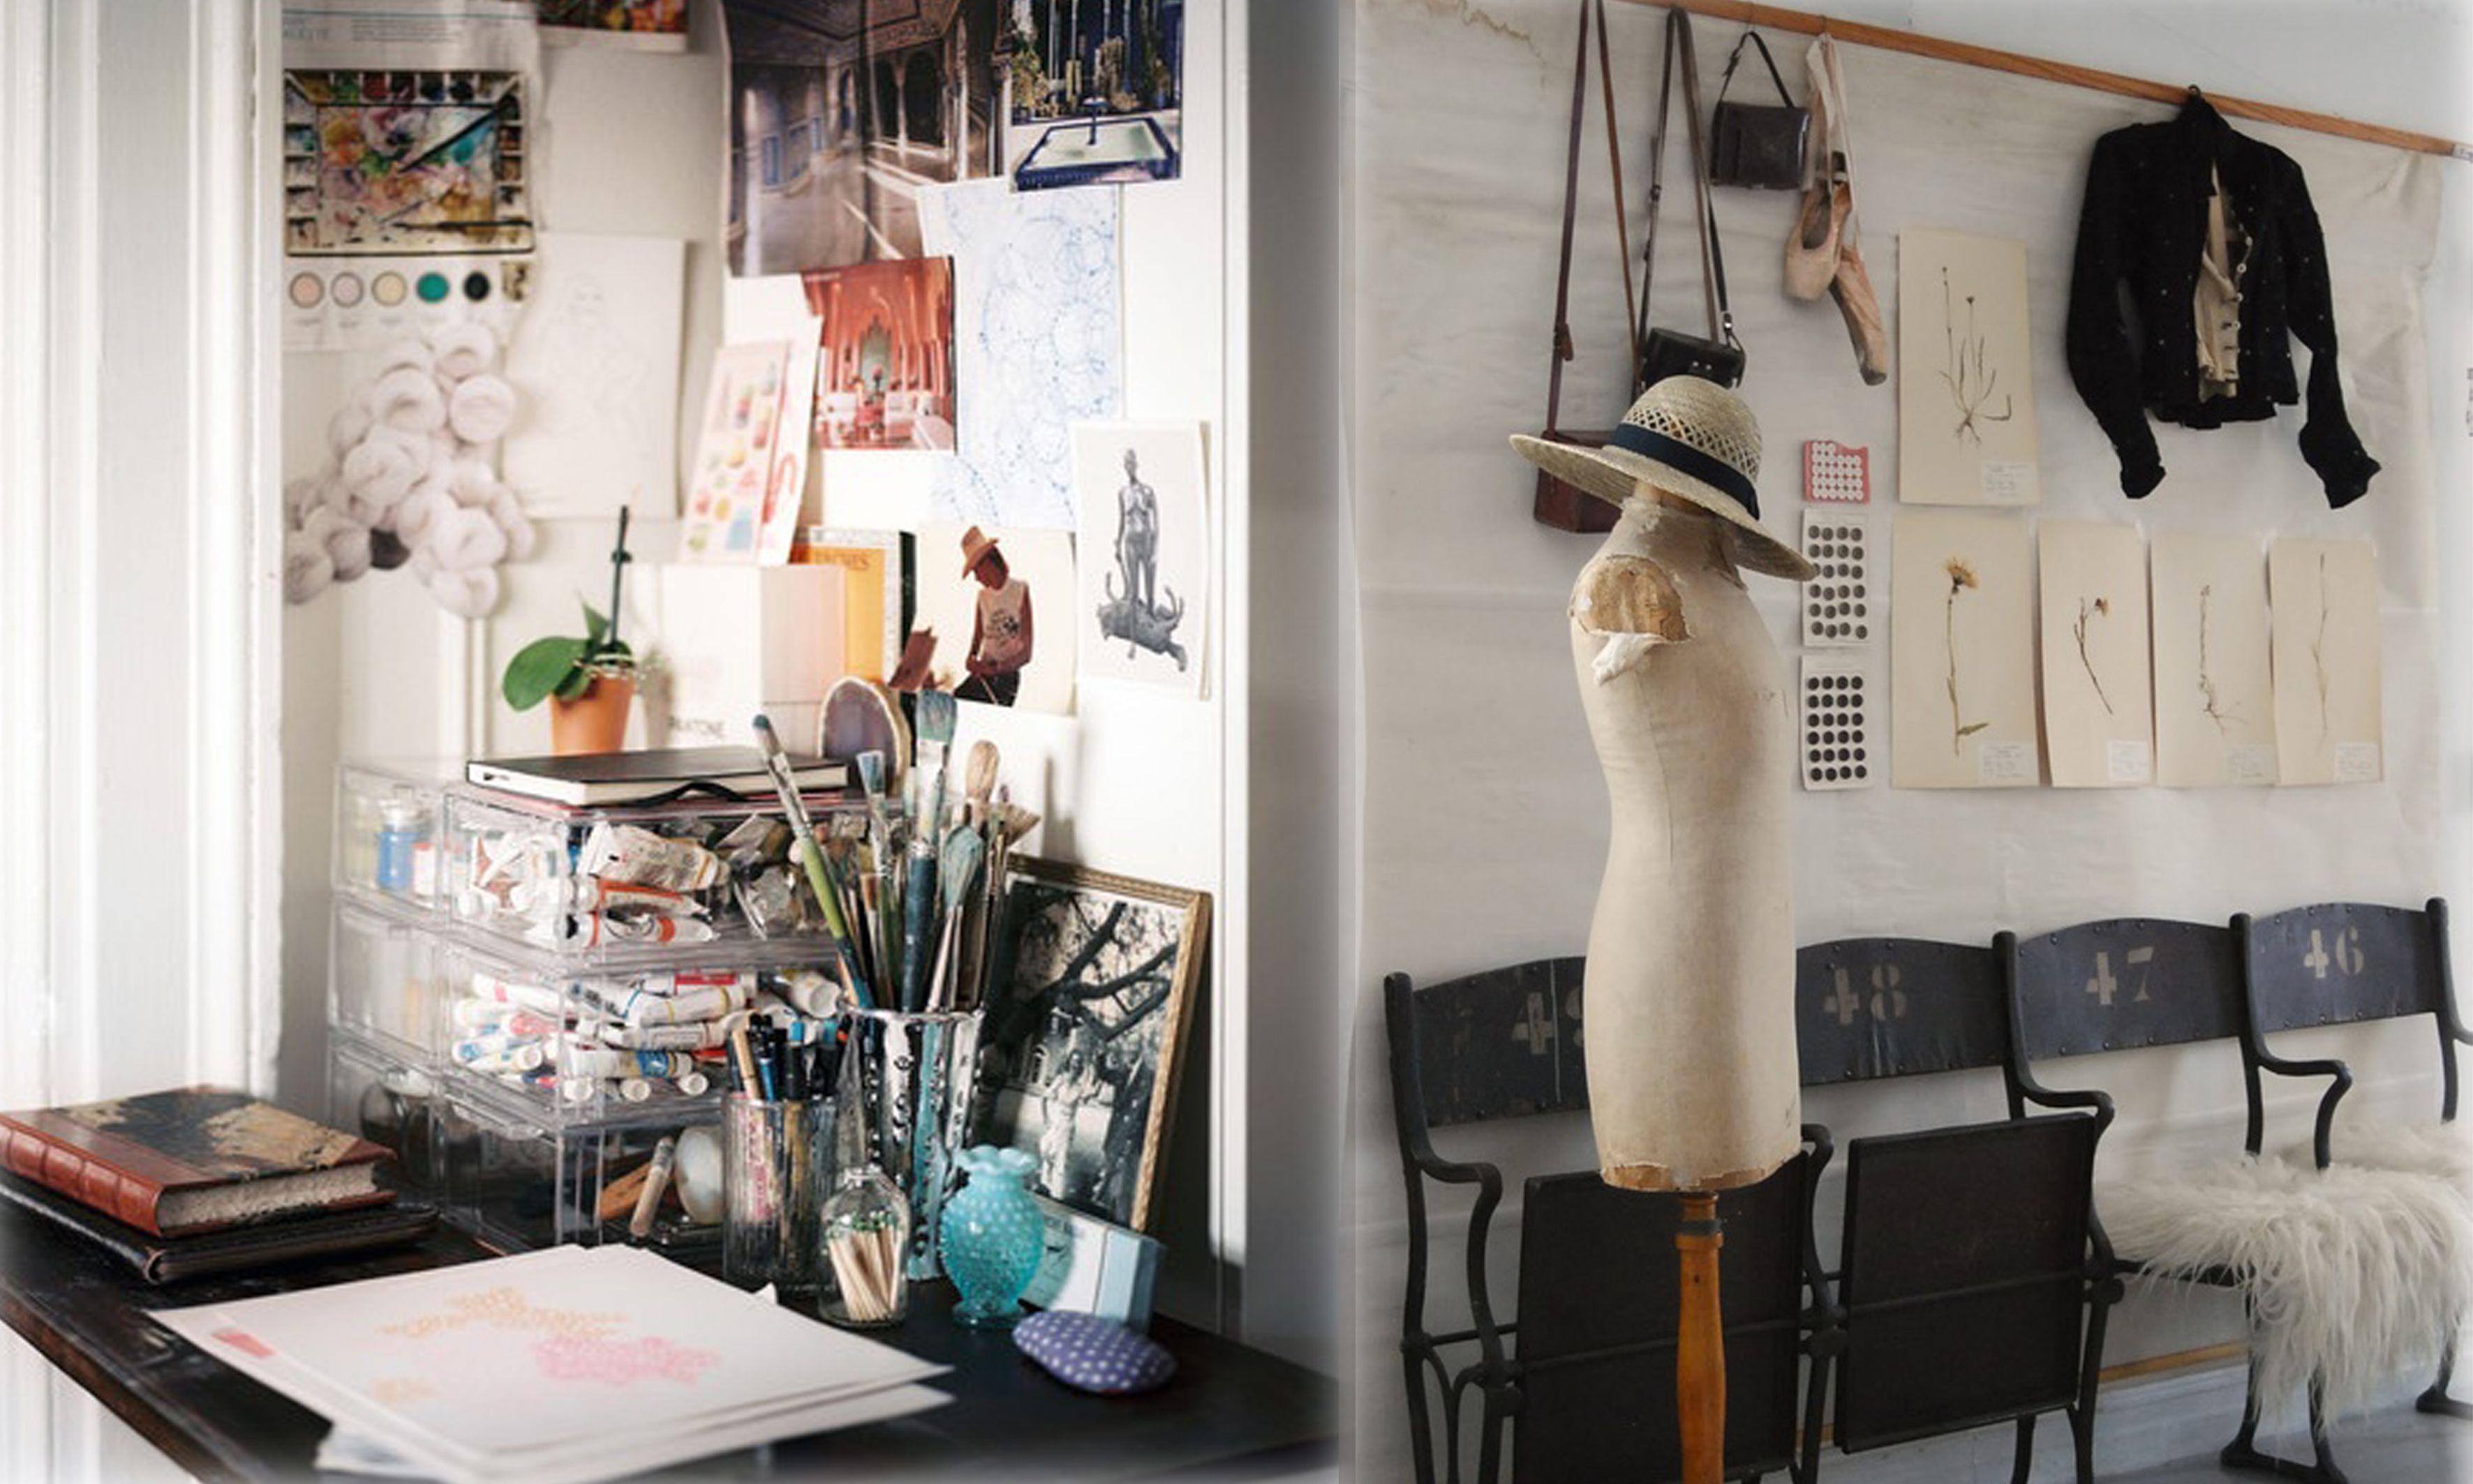 Pin by Lima Limon on PROJECT  Fashion Factory  Haberdashery shop Haberdashery Fashion